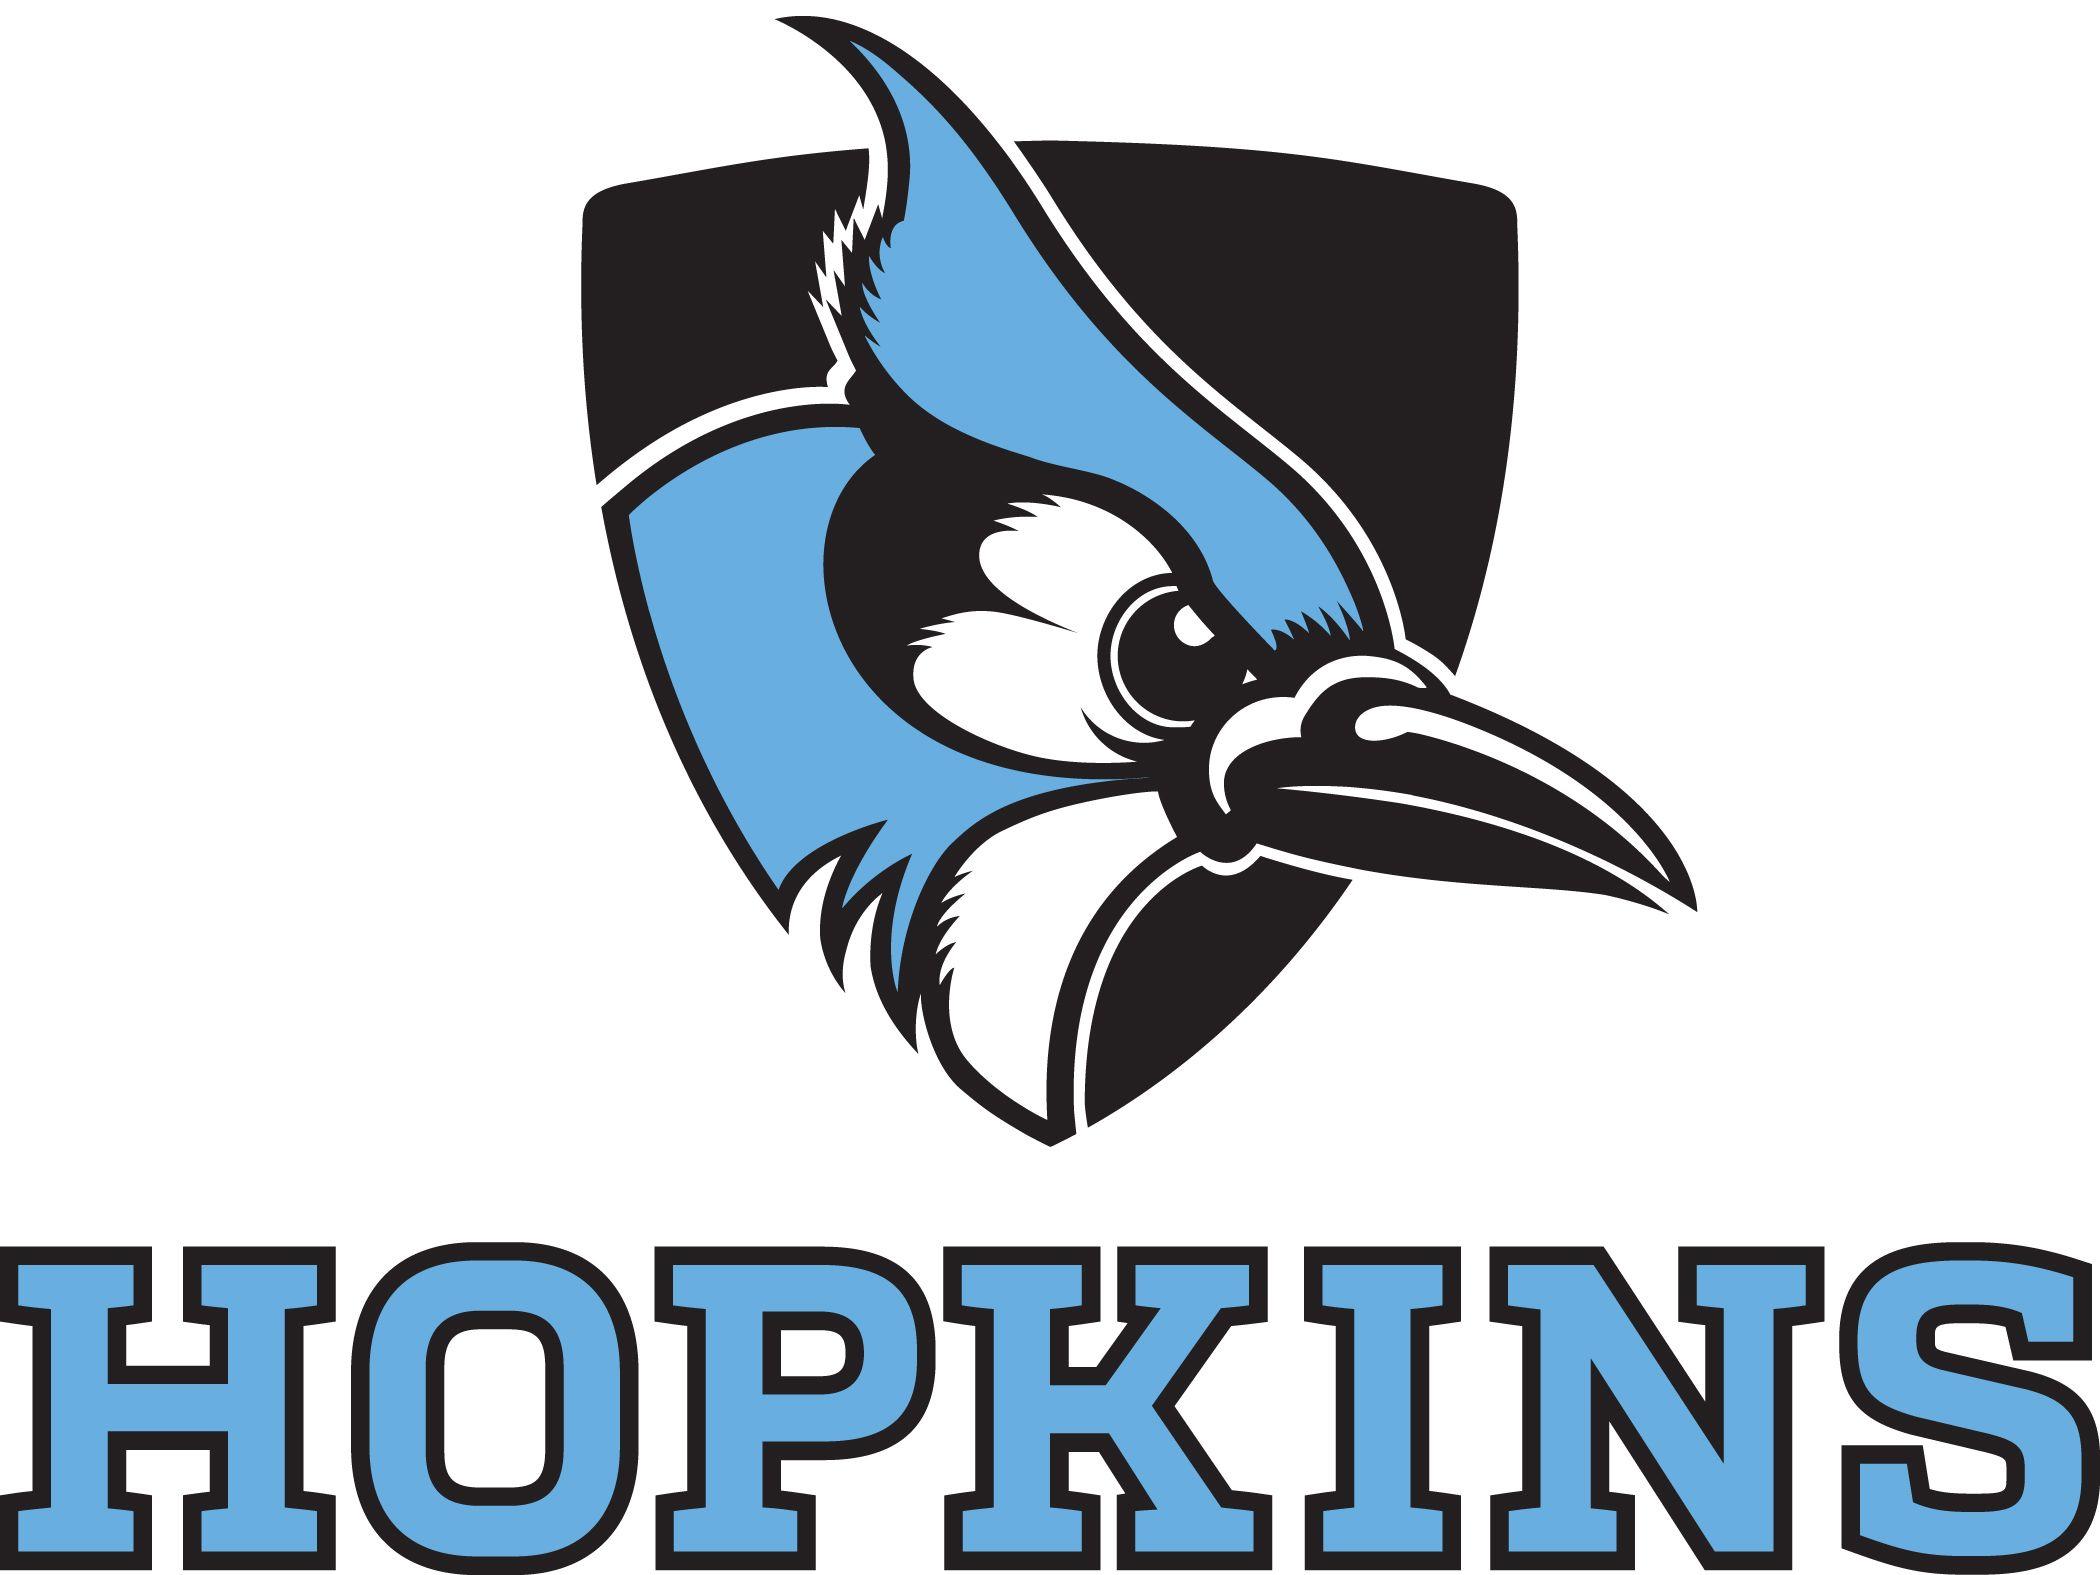 Johns hopkins Logos